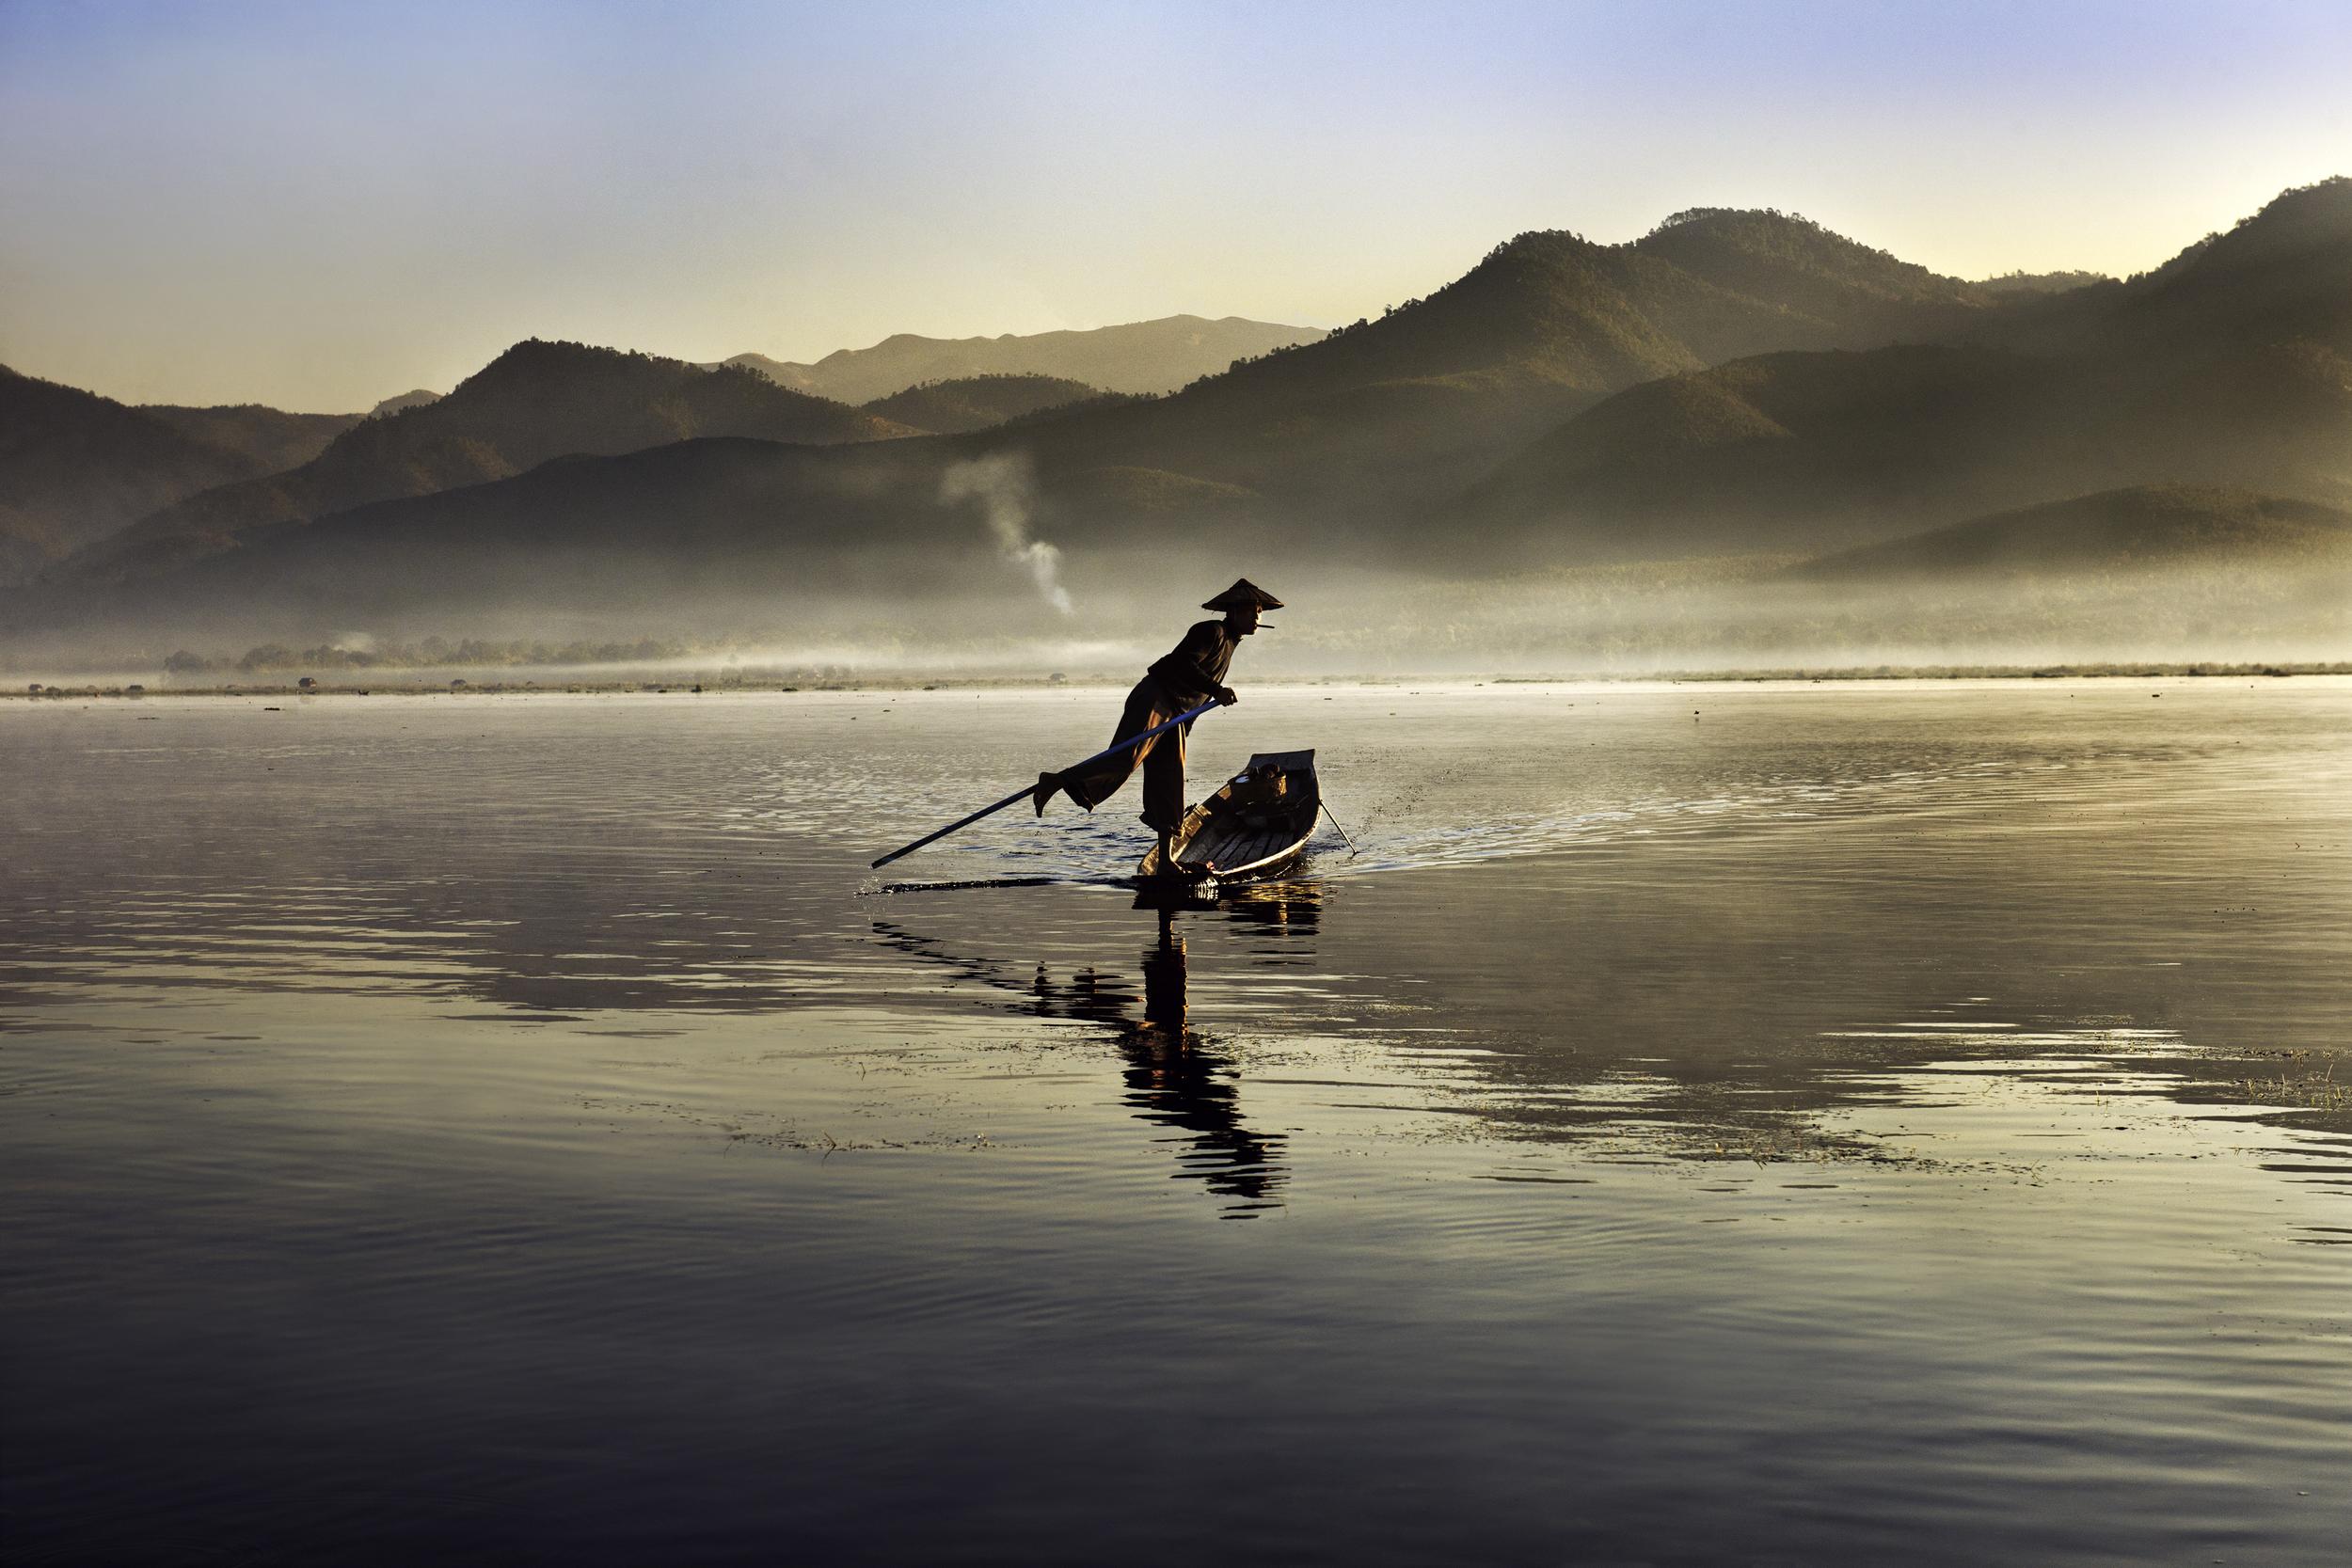 Image above: ©Steve McCurry,Stilt Fishermen, South Coast, Sri Lanka, 1995, chromogenic print on Fuji Crystal,Archive paper